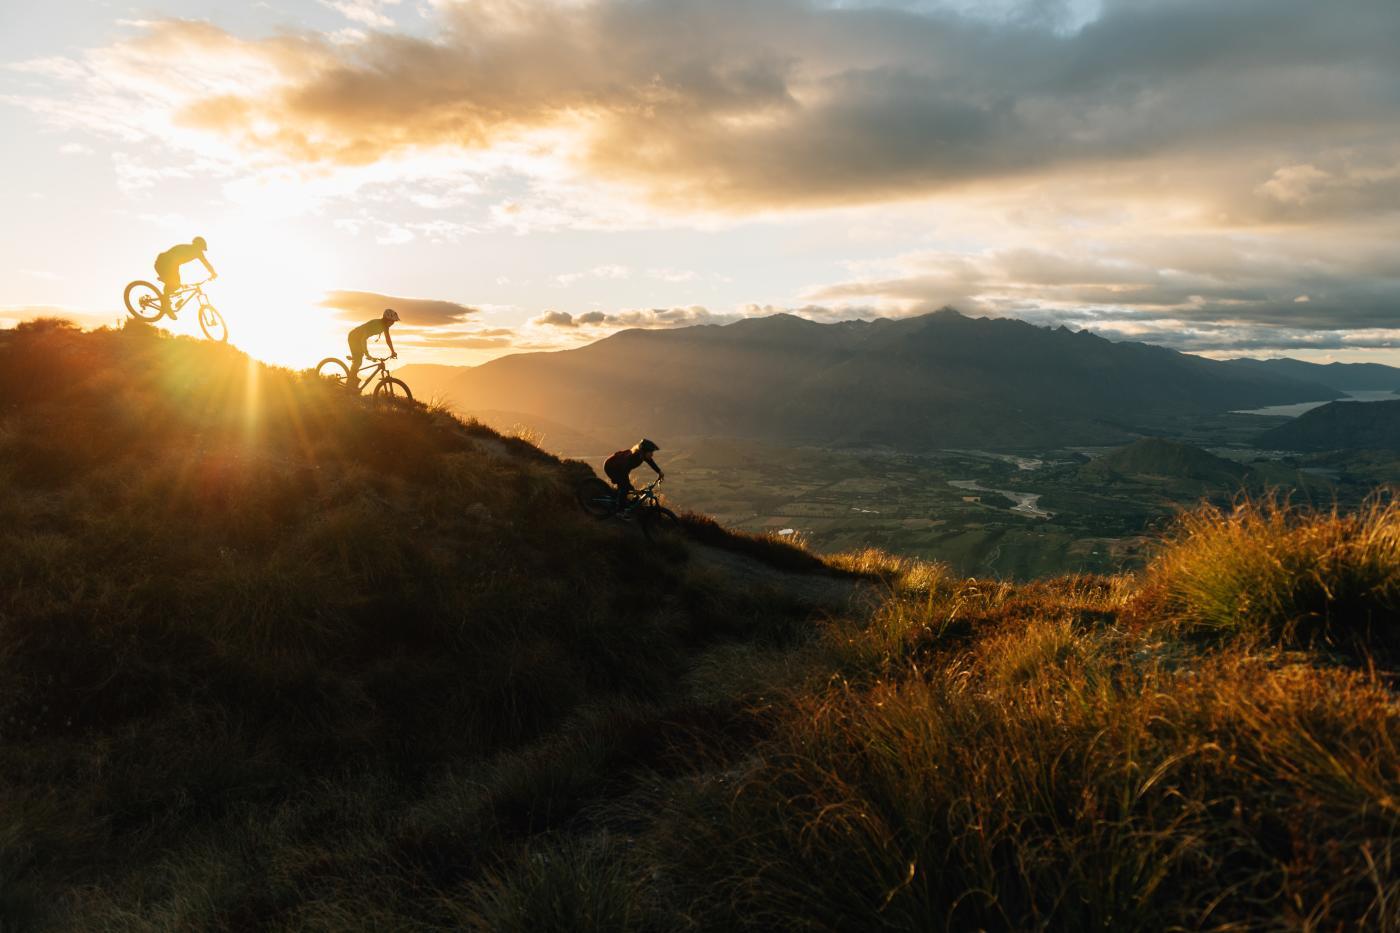 Mountain bikers at sunset biking Rude Rock, Coronet Peak Mountain Bike Trail